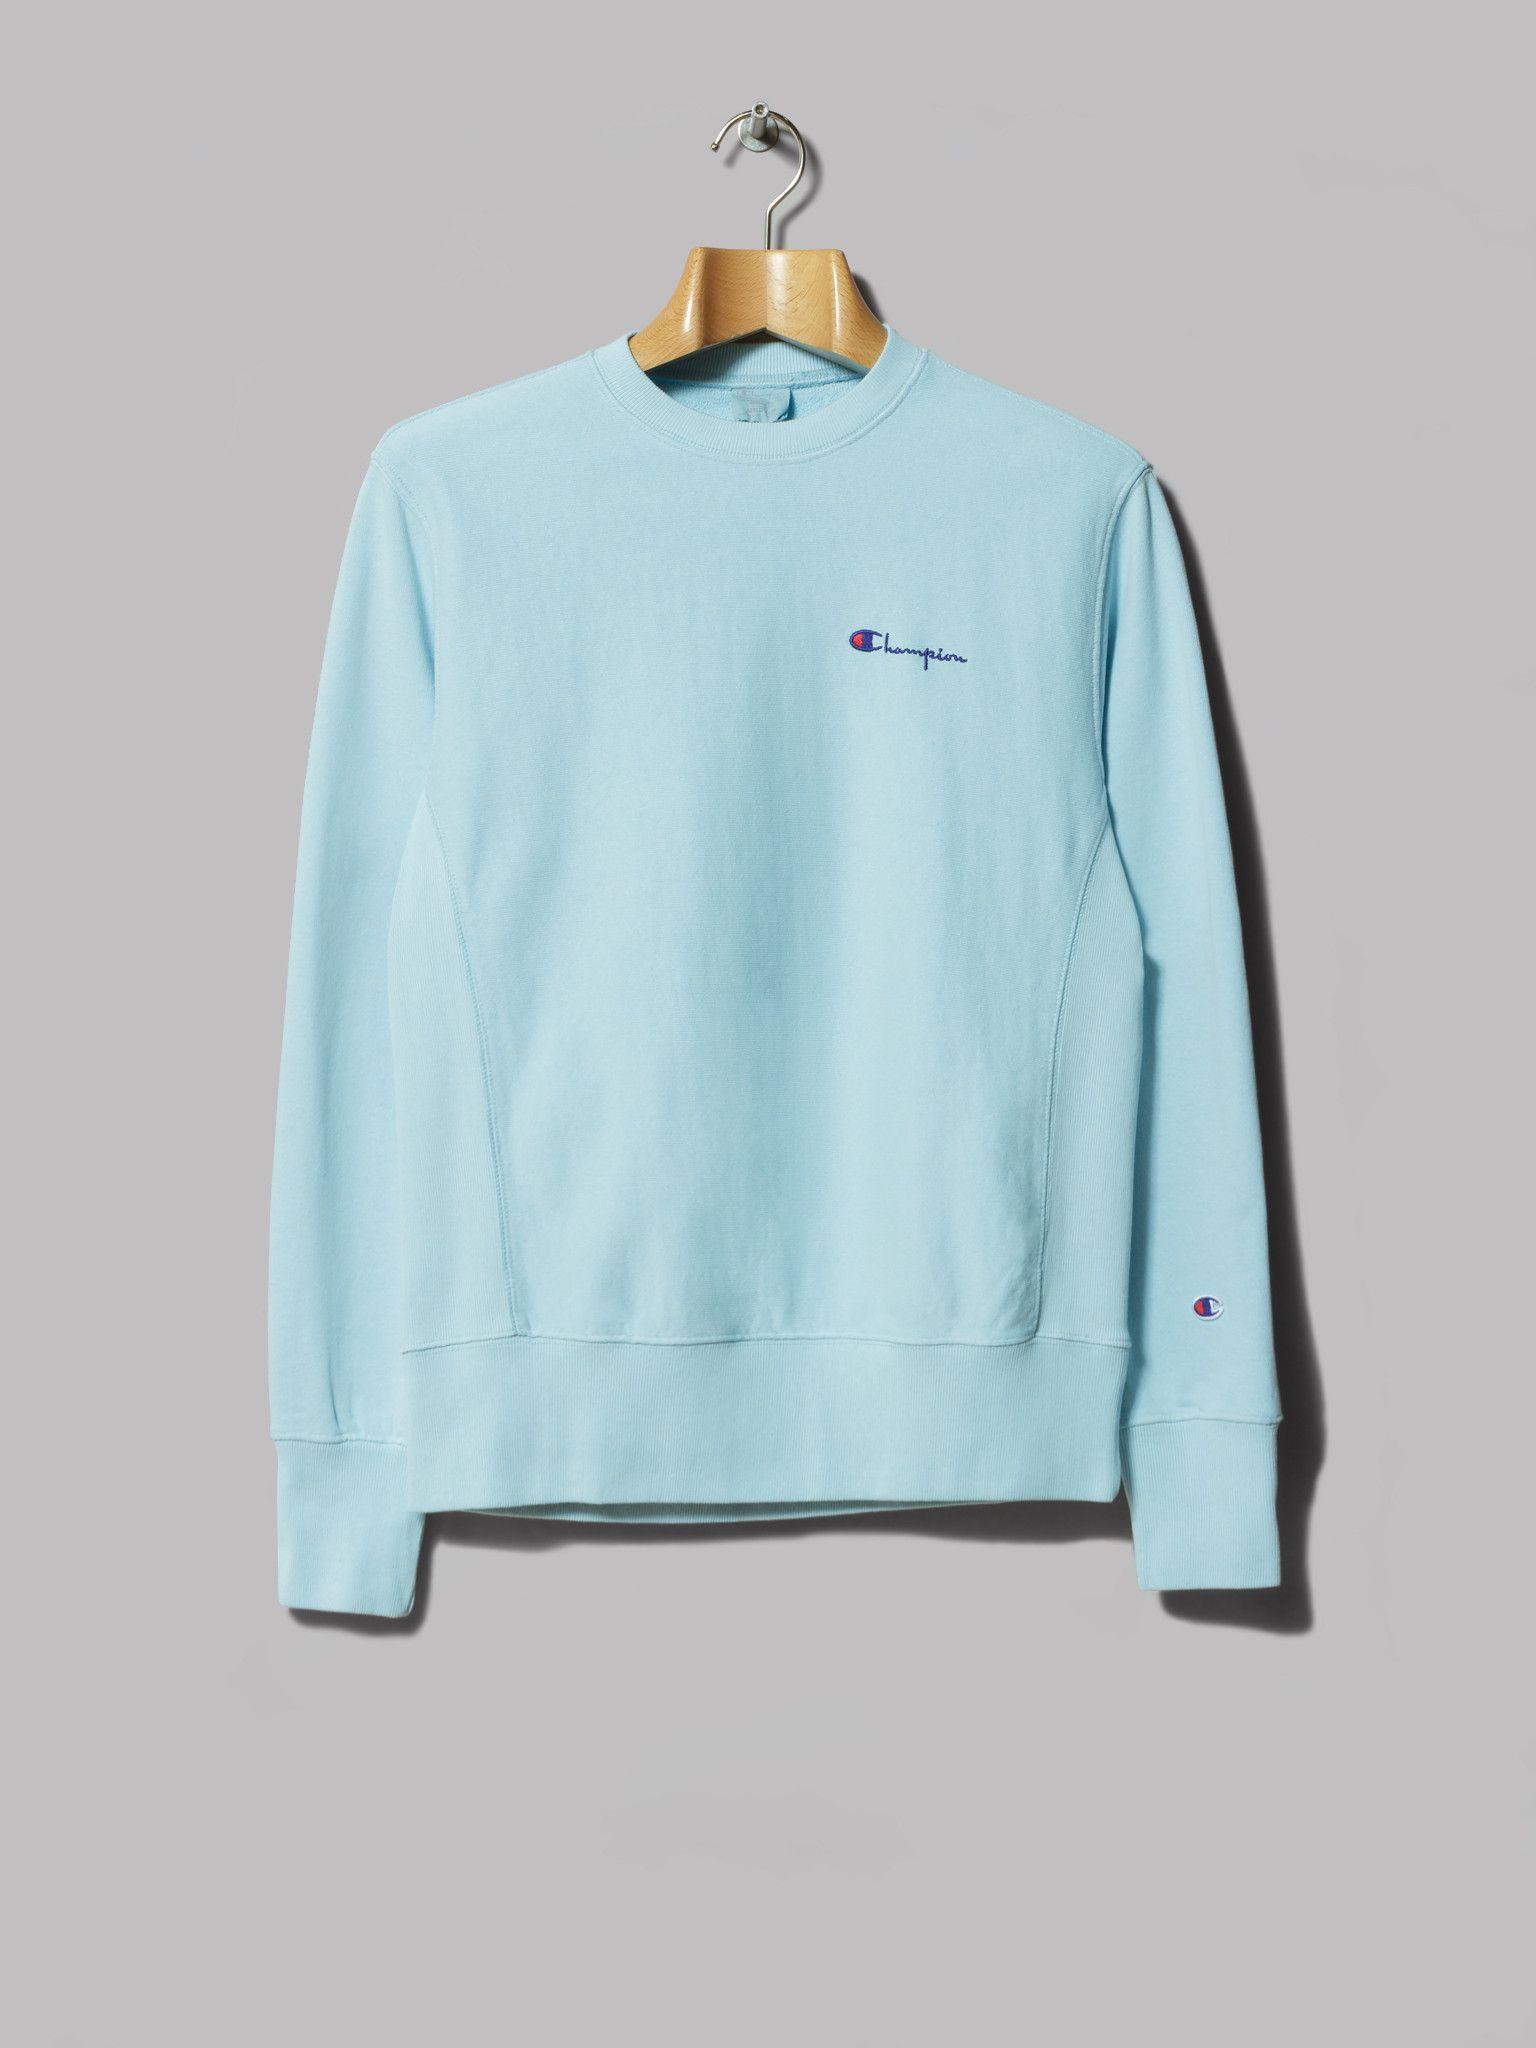 Champion Reverse Weave Crewneck Sweatshirt (Sky Blue)